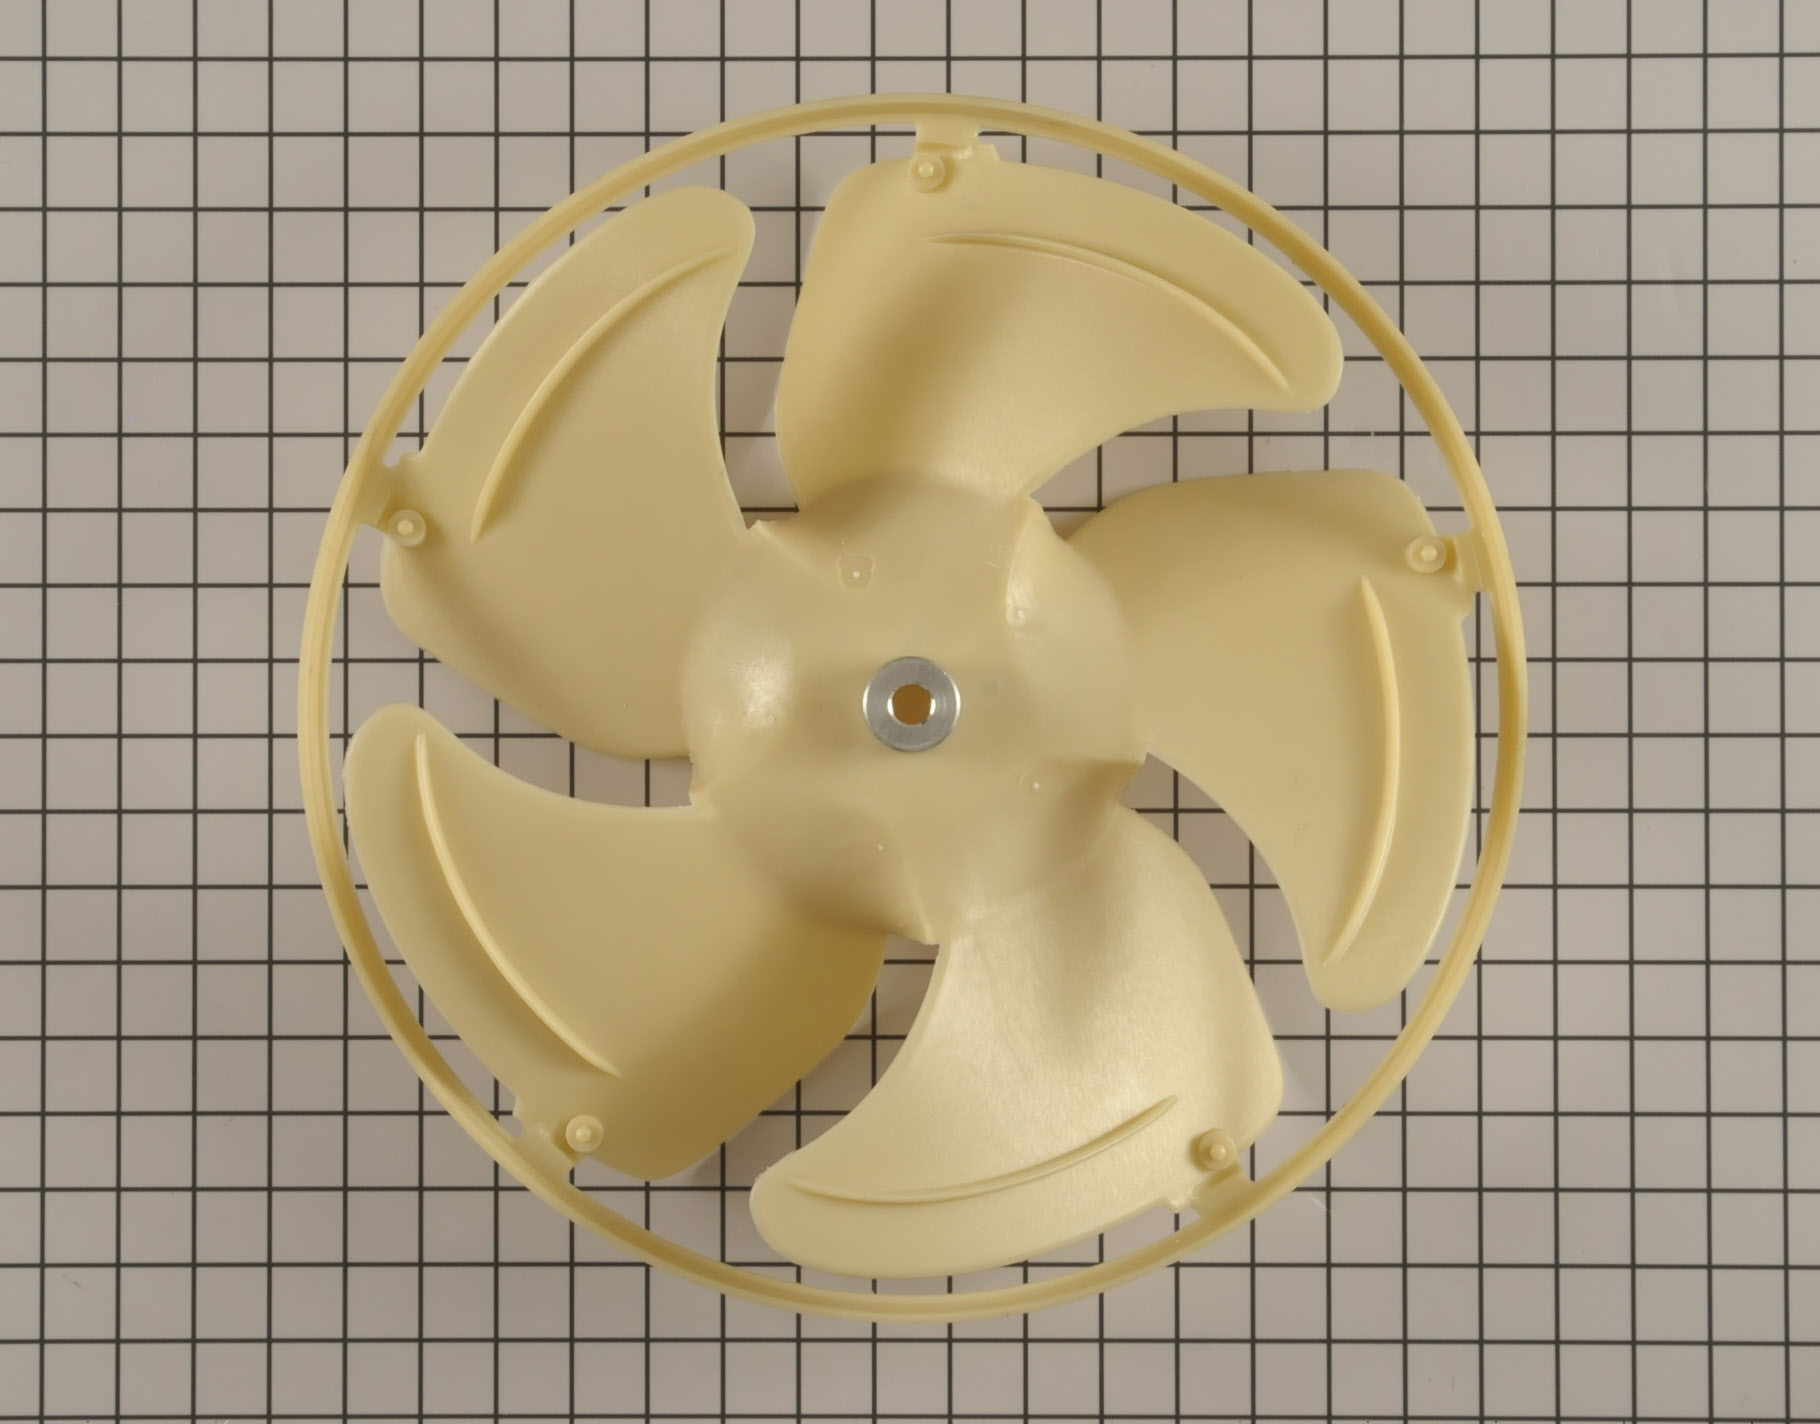 GE Air Conditioner Part # WJ73X10211 - Fan Blade